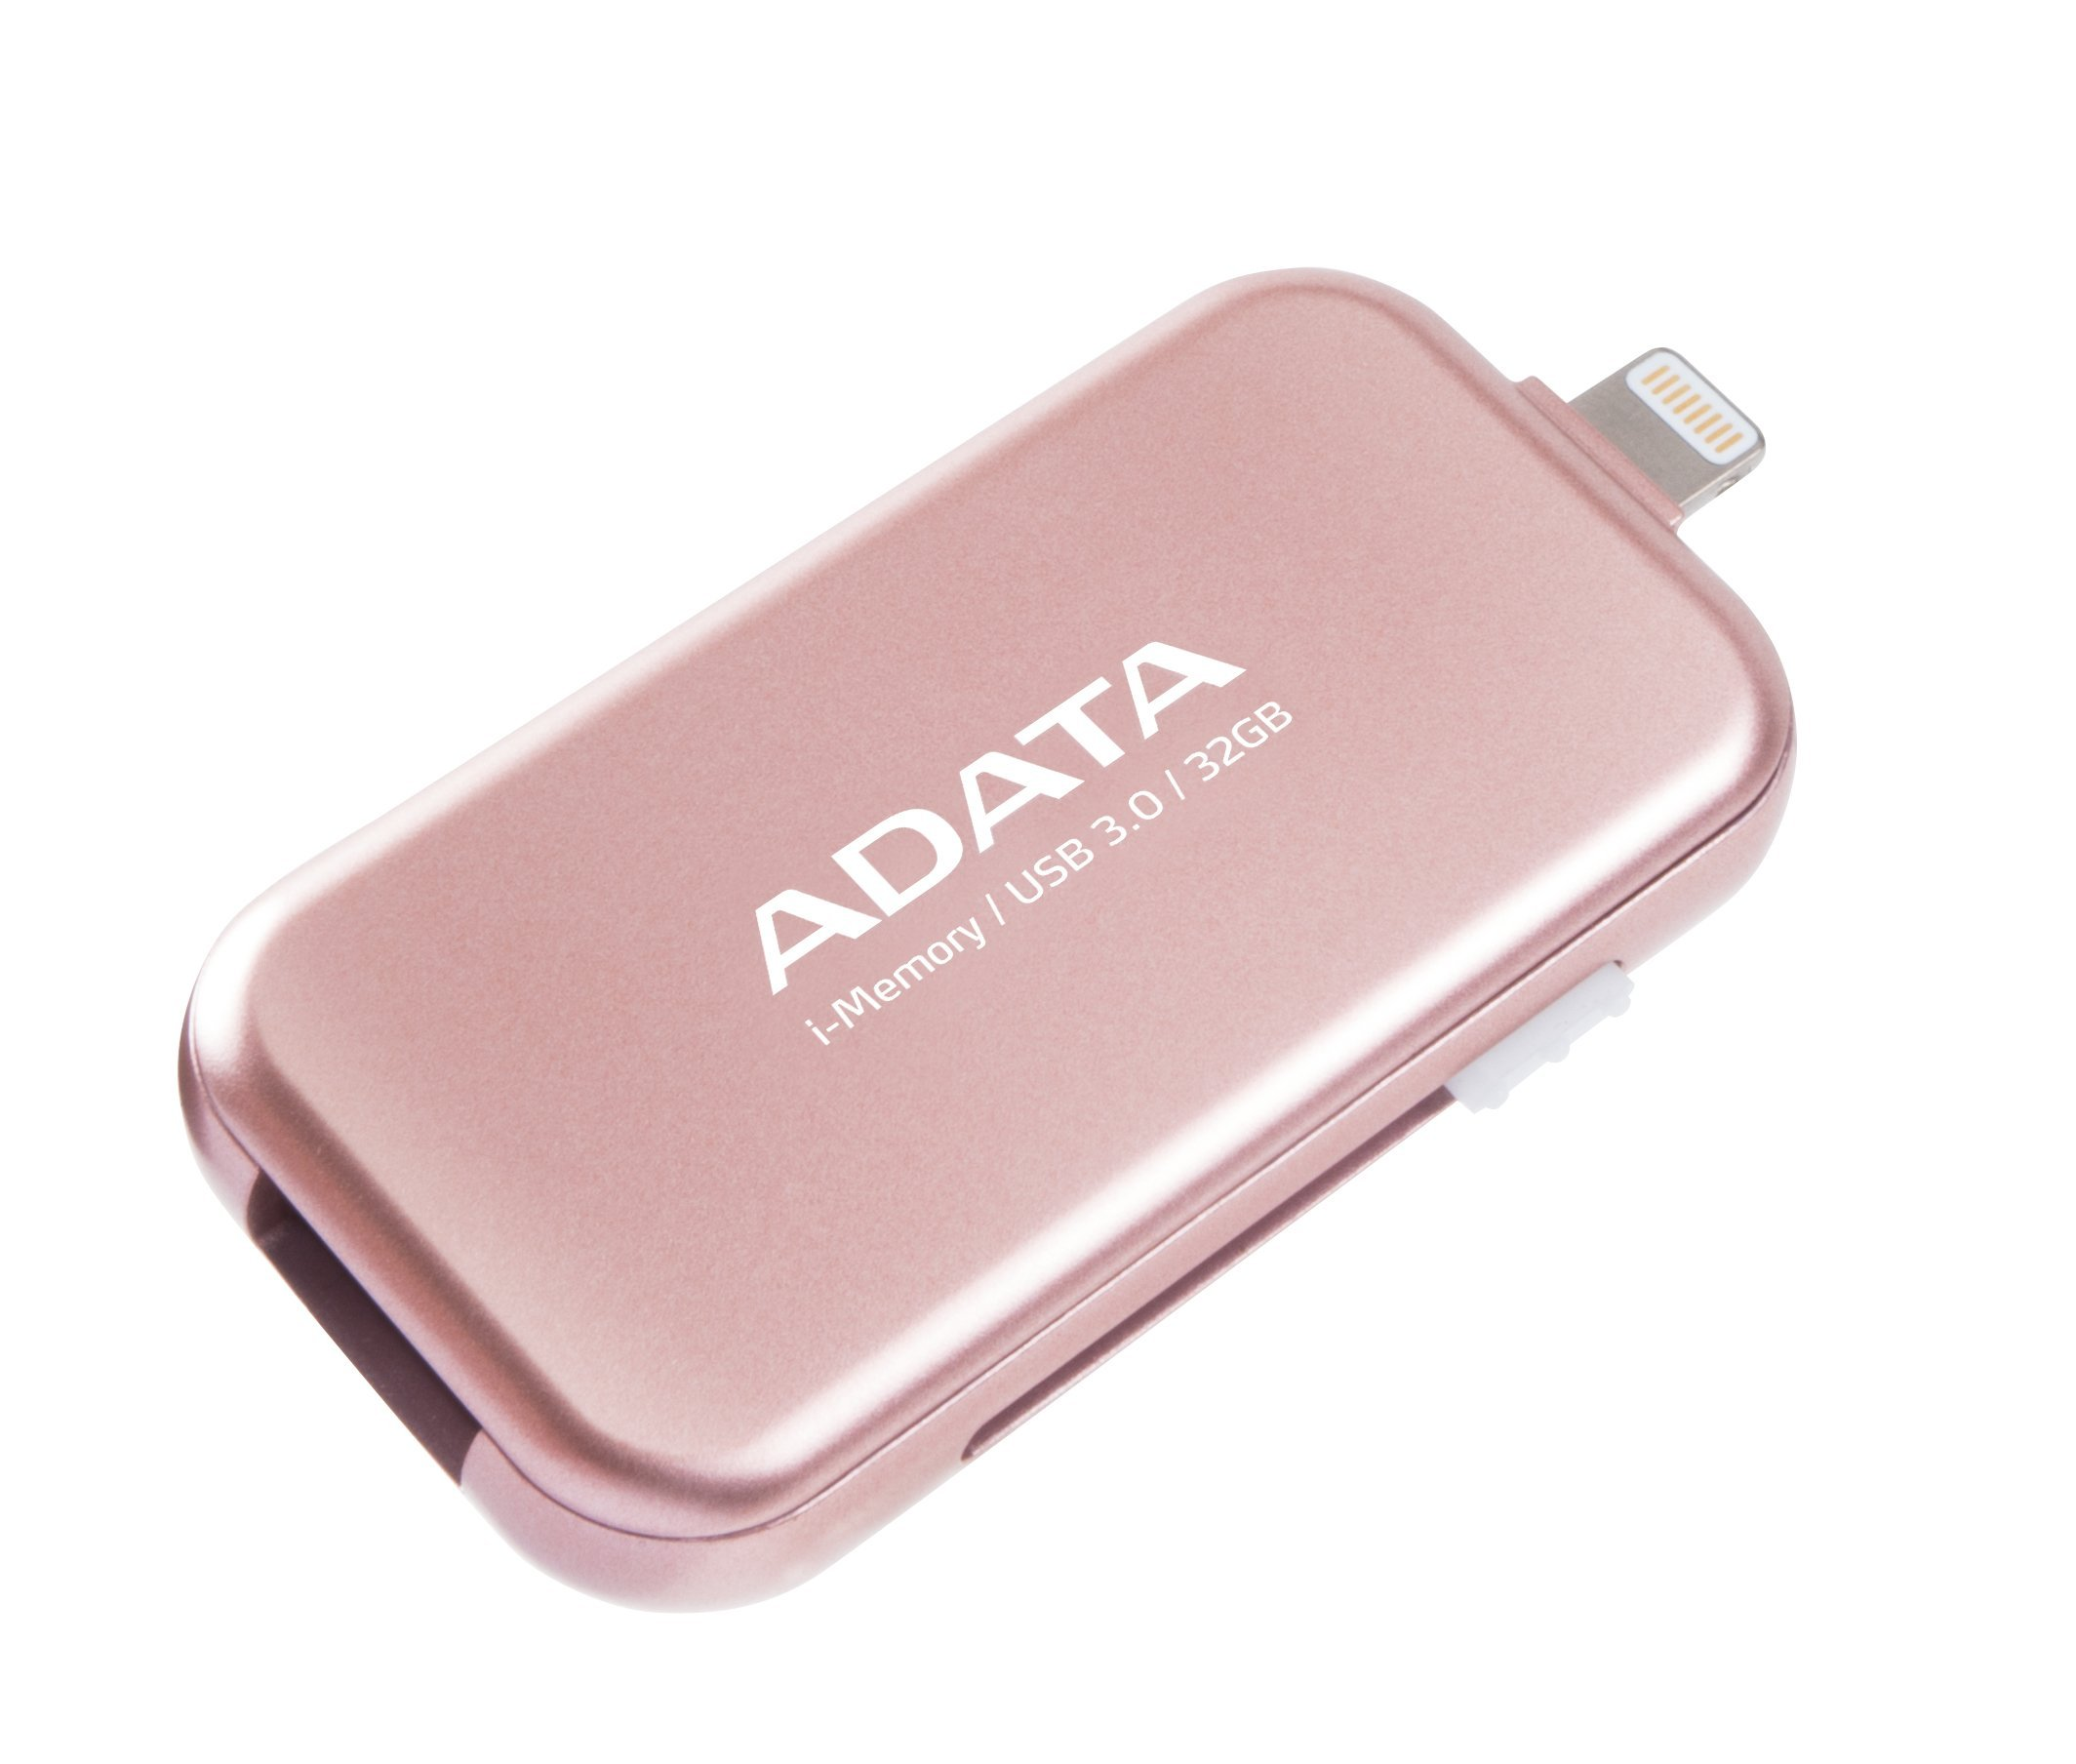 ADATA 32 GB MFi Certified Lightning/ USB 3.0 Retractable Flash Drive for iPad, PC, Rosegold (AUE710-32G-CRG)